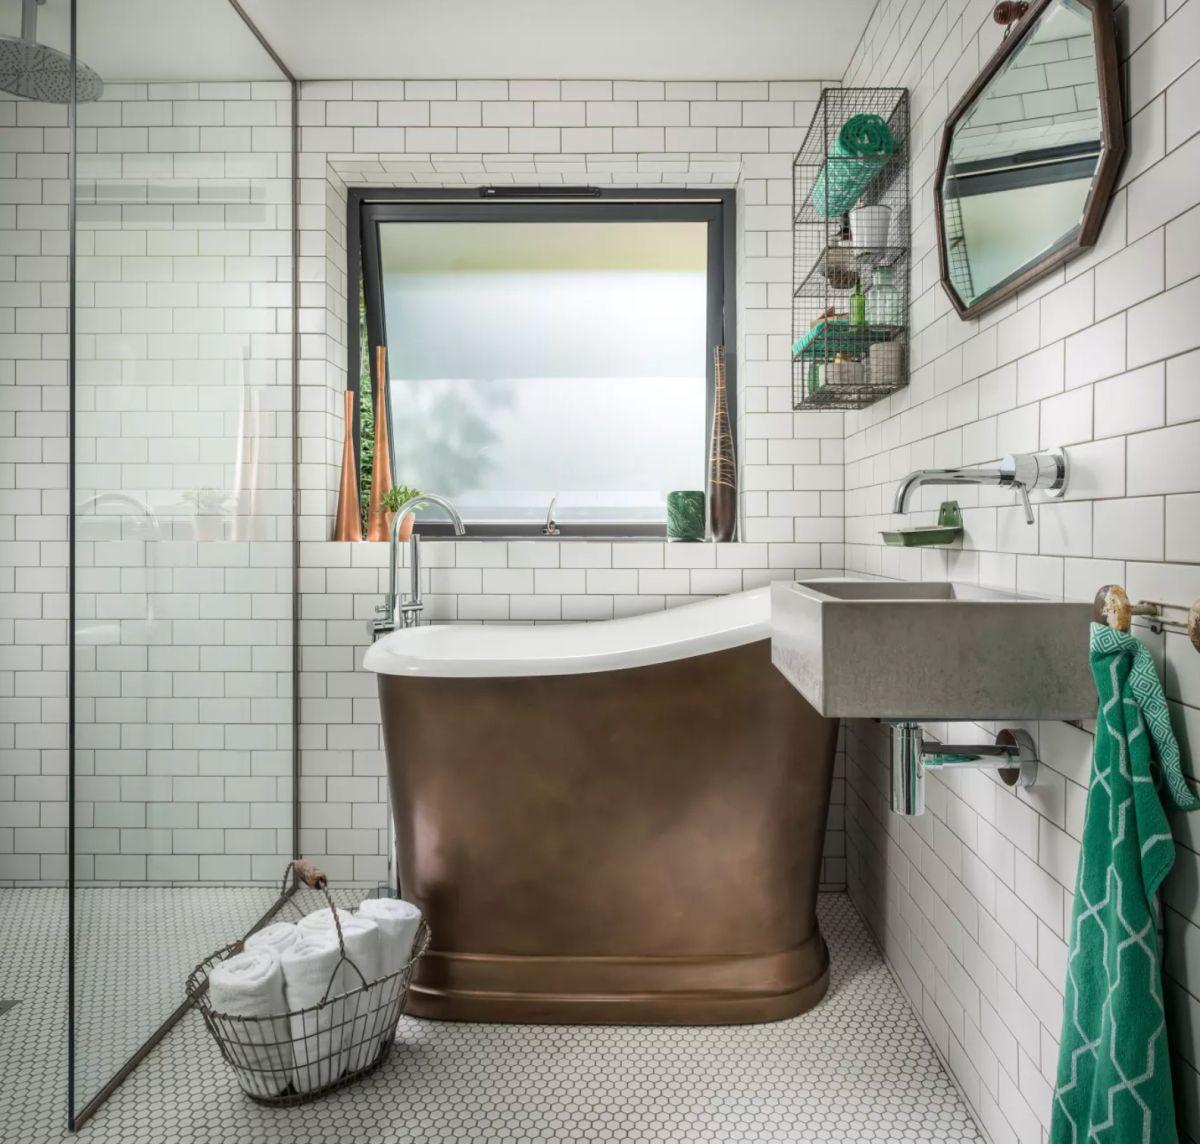 Stylish small bathroom ideas for tiny spaces